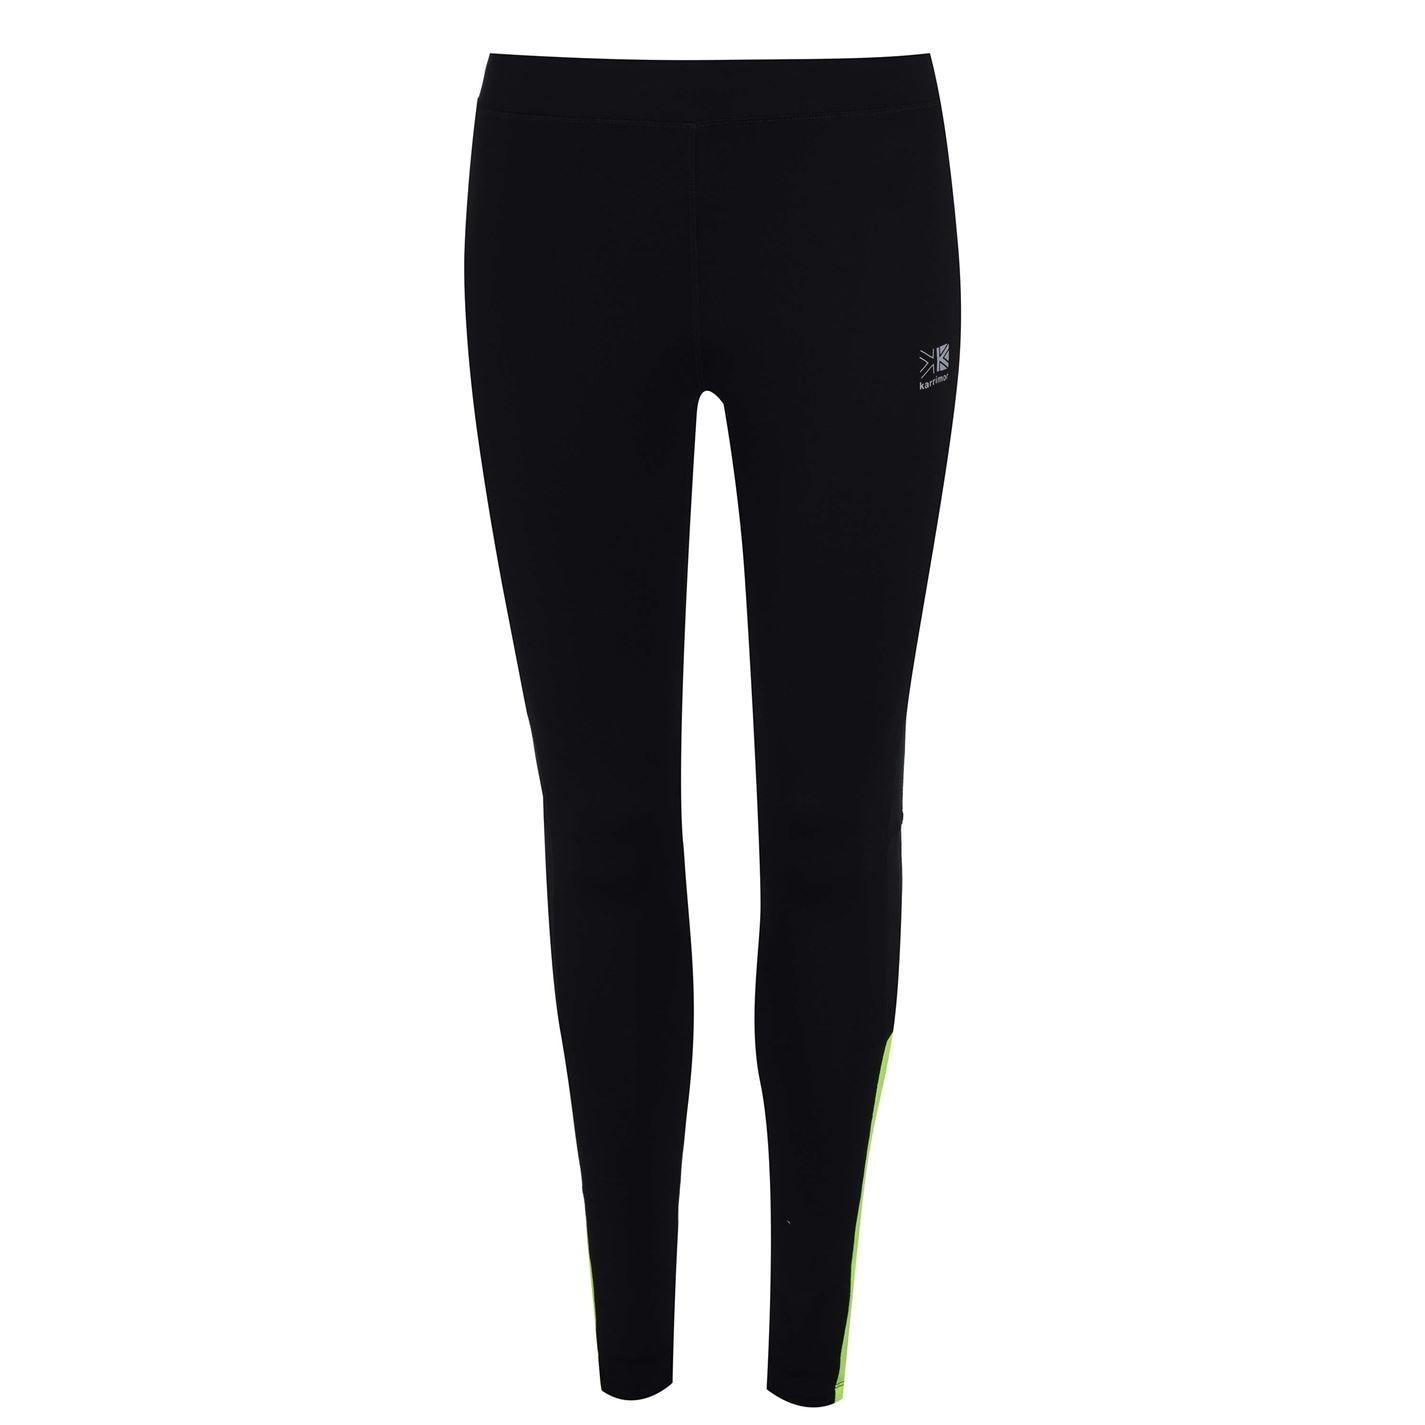 Mergi la Colanti Karrimor alergare negru fosforescent galben